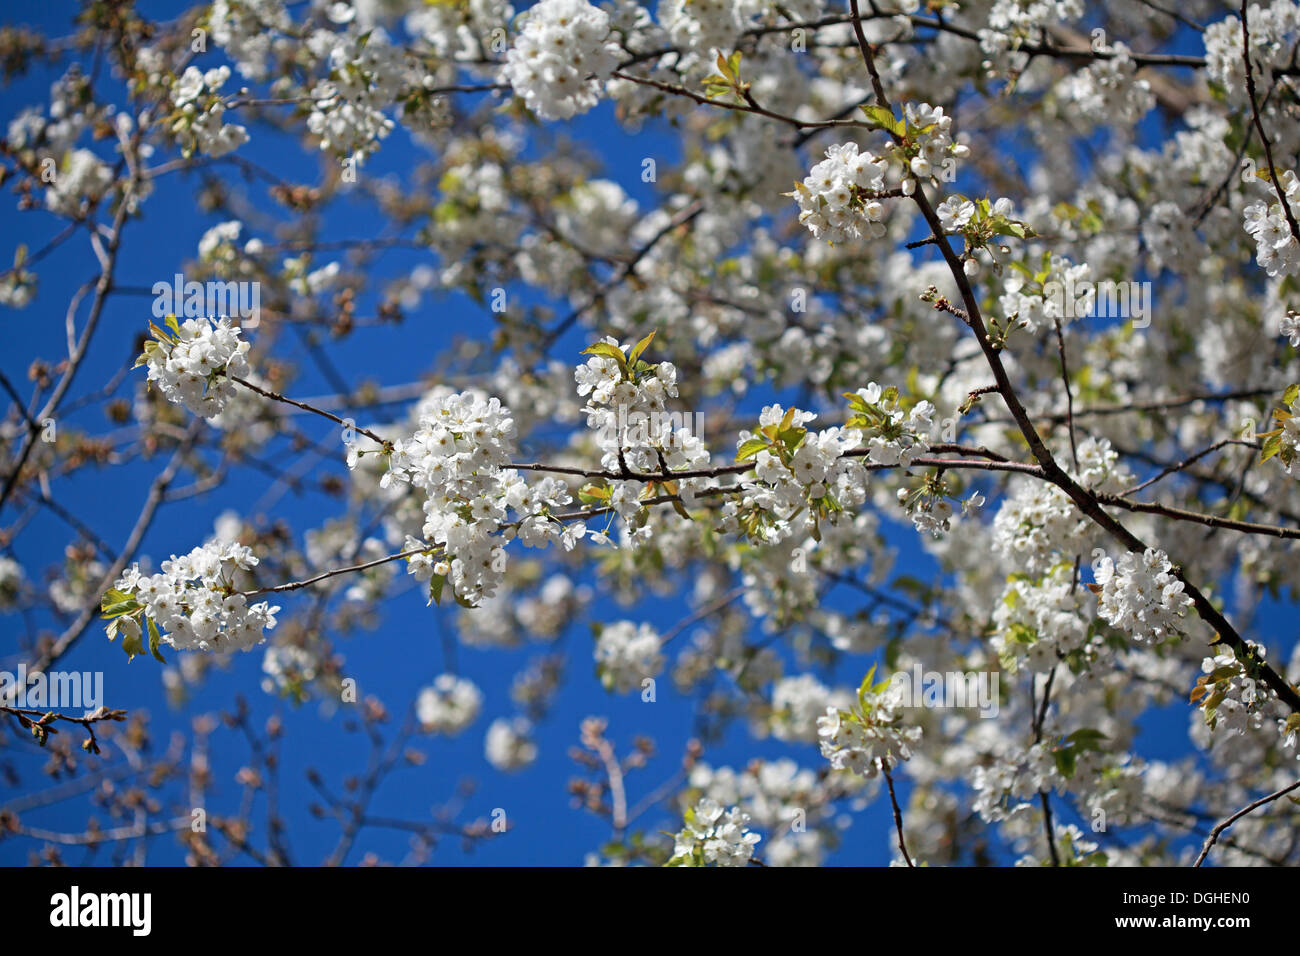 England,flower,plant,sun,sunny,sunshine,summer,shallow,focus,DOF,depth,of,field,D.O.F.,spring,UK,nature,natural,attractive,blossom,darling,buds,bud,first,garden,gardens,gardening,advice,gardeners,question,time,GQT,radio4,radio,4,four,sweet,cherry,tree,Prunus,avium,courtyards,groves of crab apples,gotonysmith,Prunusavium,Kyoto,sakura,fruit,shrub,tree,plant,shrub,tree,trees,tall,blue,sky,cherry,plum,Prunus,cerasifera,Mirabelle,plums,super,shots,of,life,eco,newlife,redemption,revive,revival,Buy Pictures of,Buy Images Of